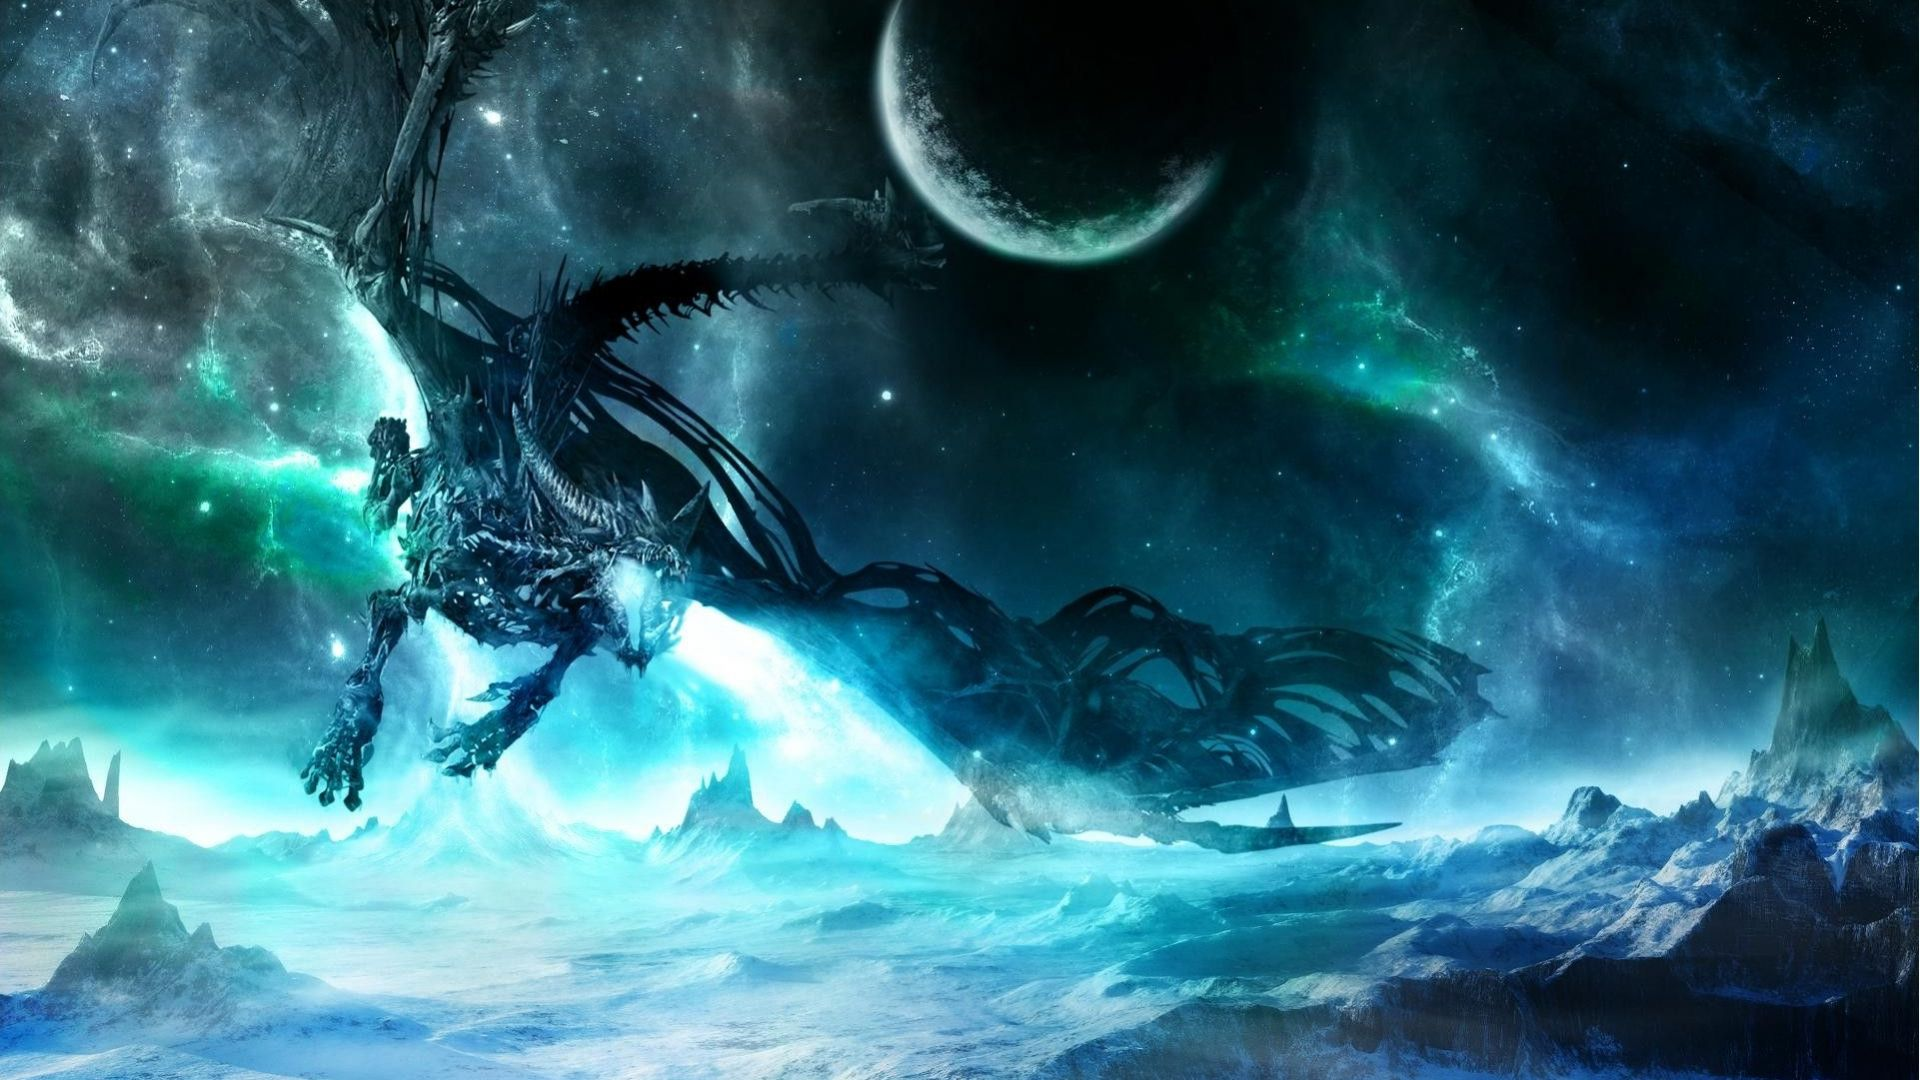 Galaxy Dragon Wallpapers Top Free Galaxy Dragon Backgrounds Wallpaperaccess